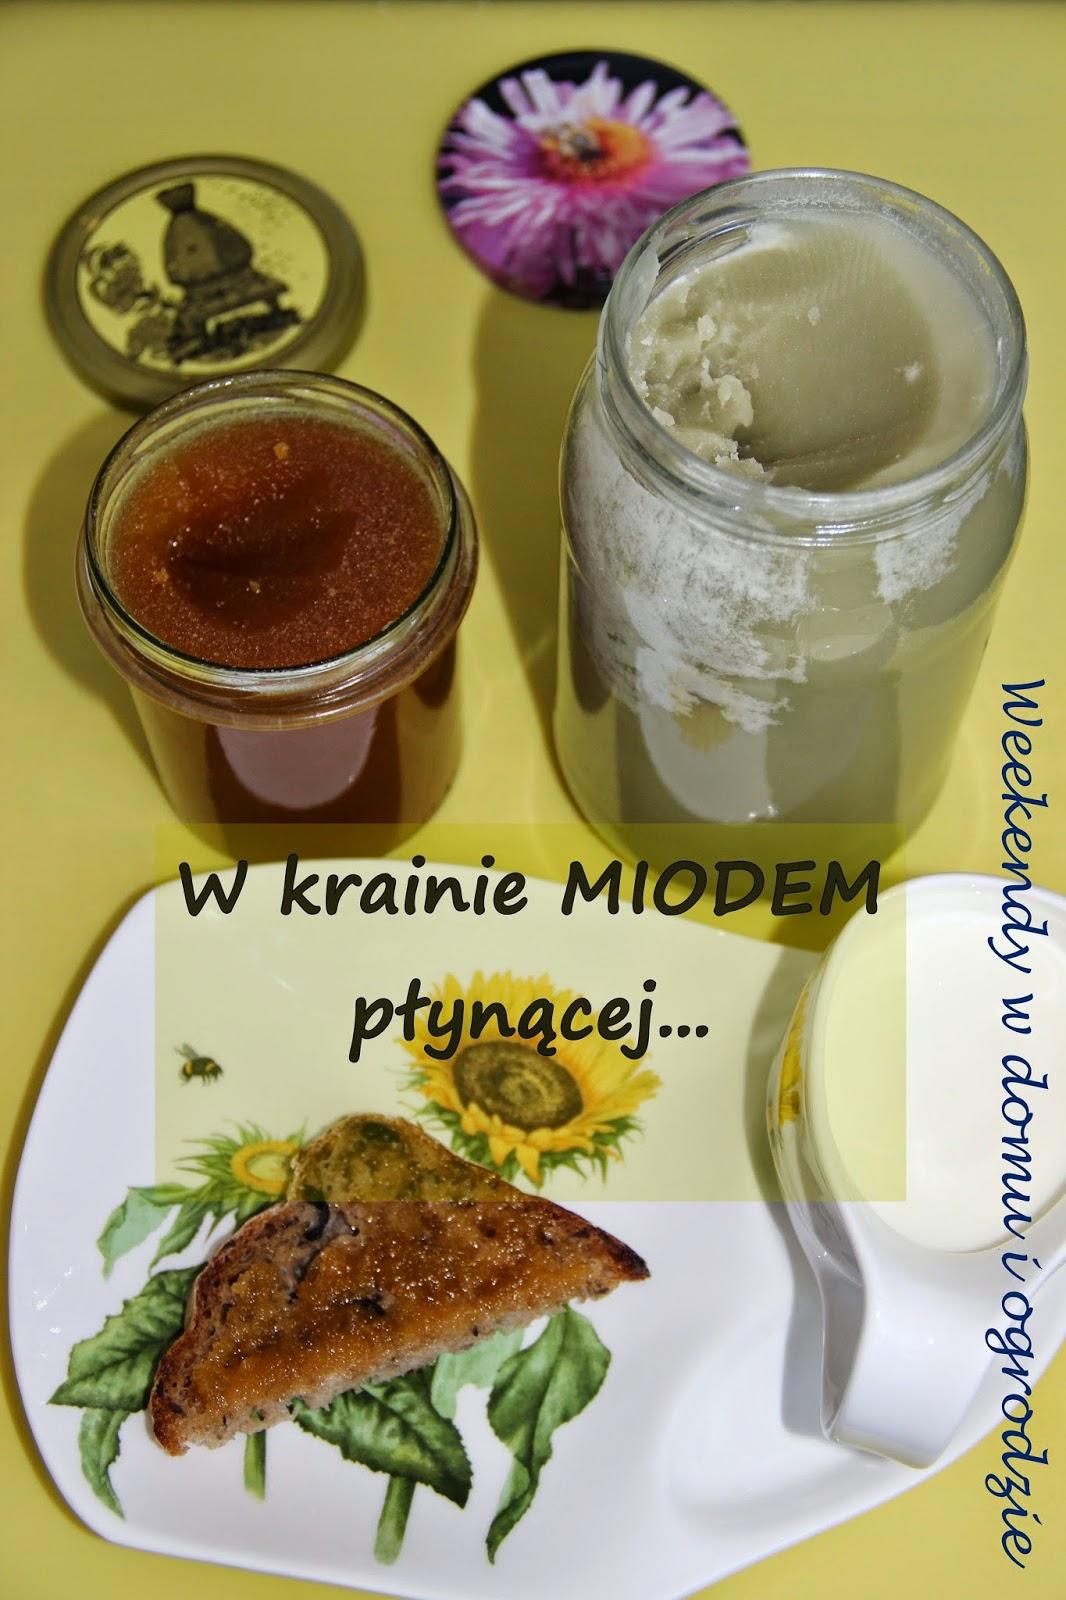 "<a href=""http://weekendywdomuiogrodzie.blogspot.com/2015/03/w-krainie-miodem-pynacej-akcja-kulinarna.html"" target=""_blank""><img alt=""http://weekendywdomuiogrodzie.blogspot.com/2015/03/w-krainie-miodem-pynacej-akcja-kulinarna.html"" border=""0"" src=""http://4.bp.blogspot.com/-84yIQNlQFRY/VQlt2TJ6OWI/AAAAAAAAAhY/K7FeAd_pgcY/s1600/akcja-miod1a.jpg"" height=""200"" width=""133"" /></a>"